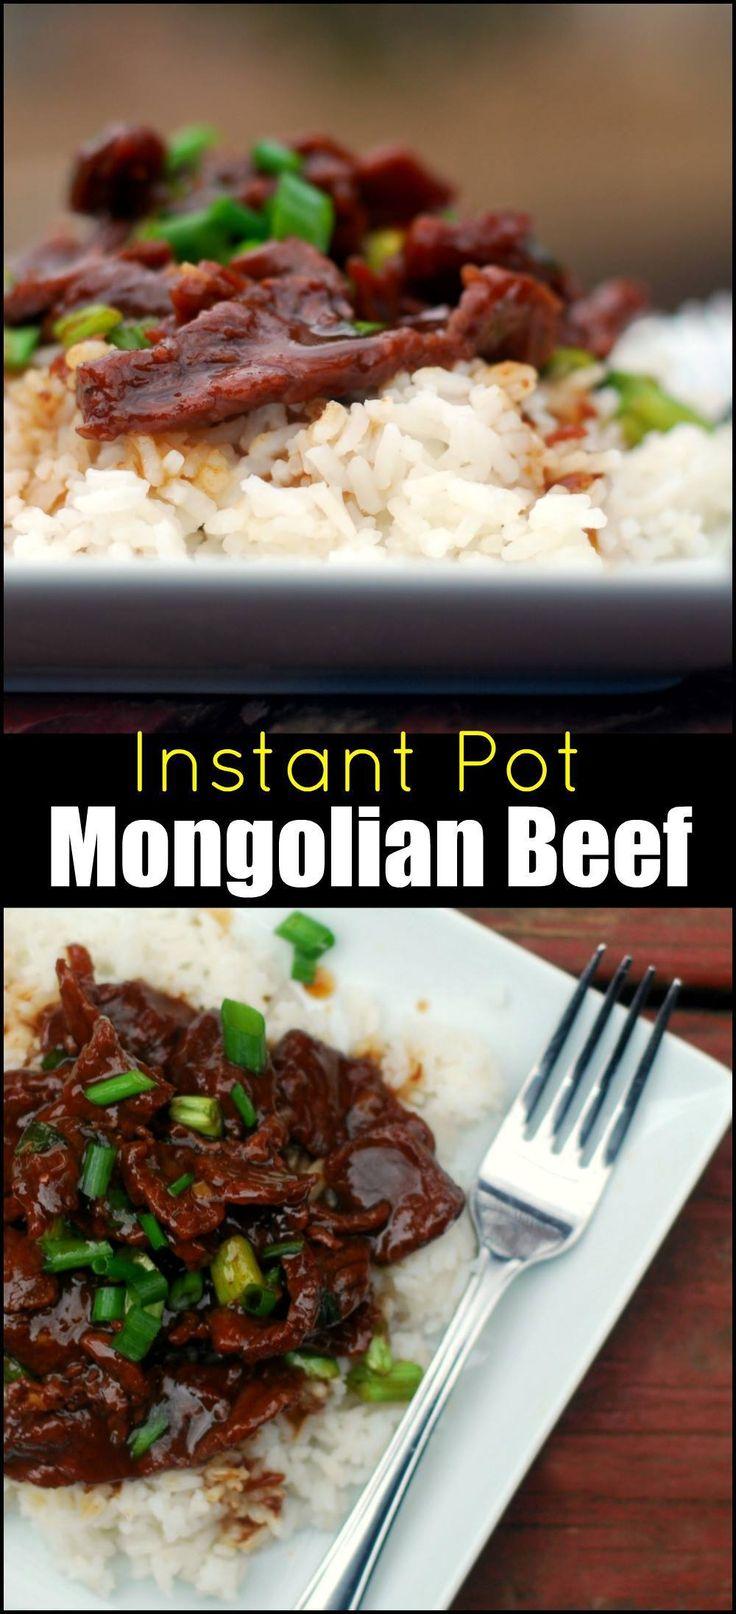 Instant Pot Mongolian Beef | Aunt Bee's Recipes